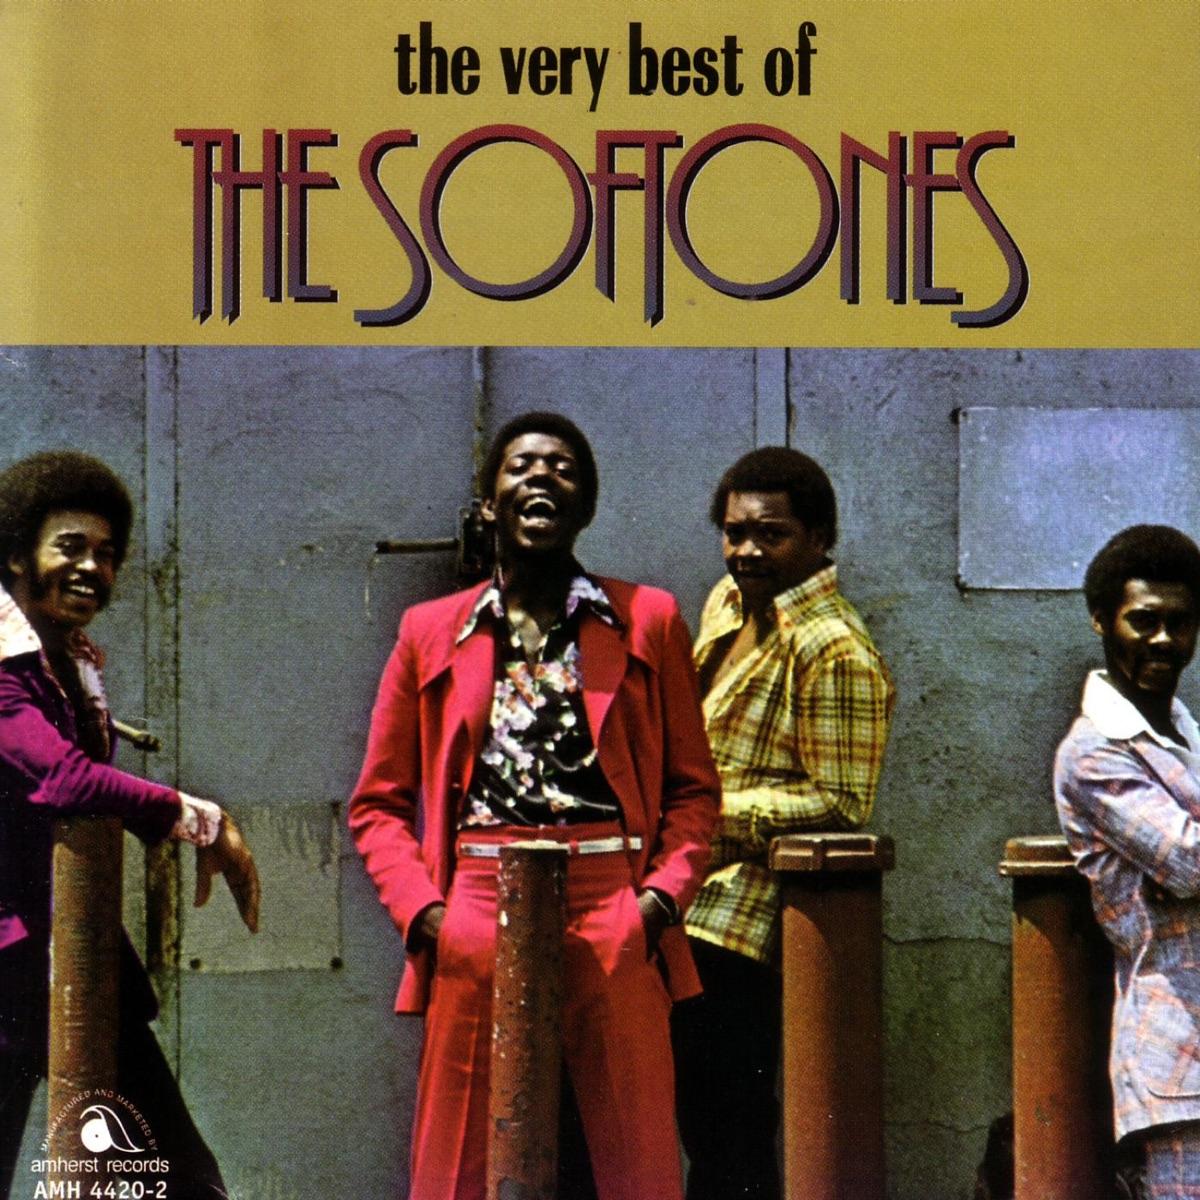 The Softones